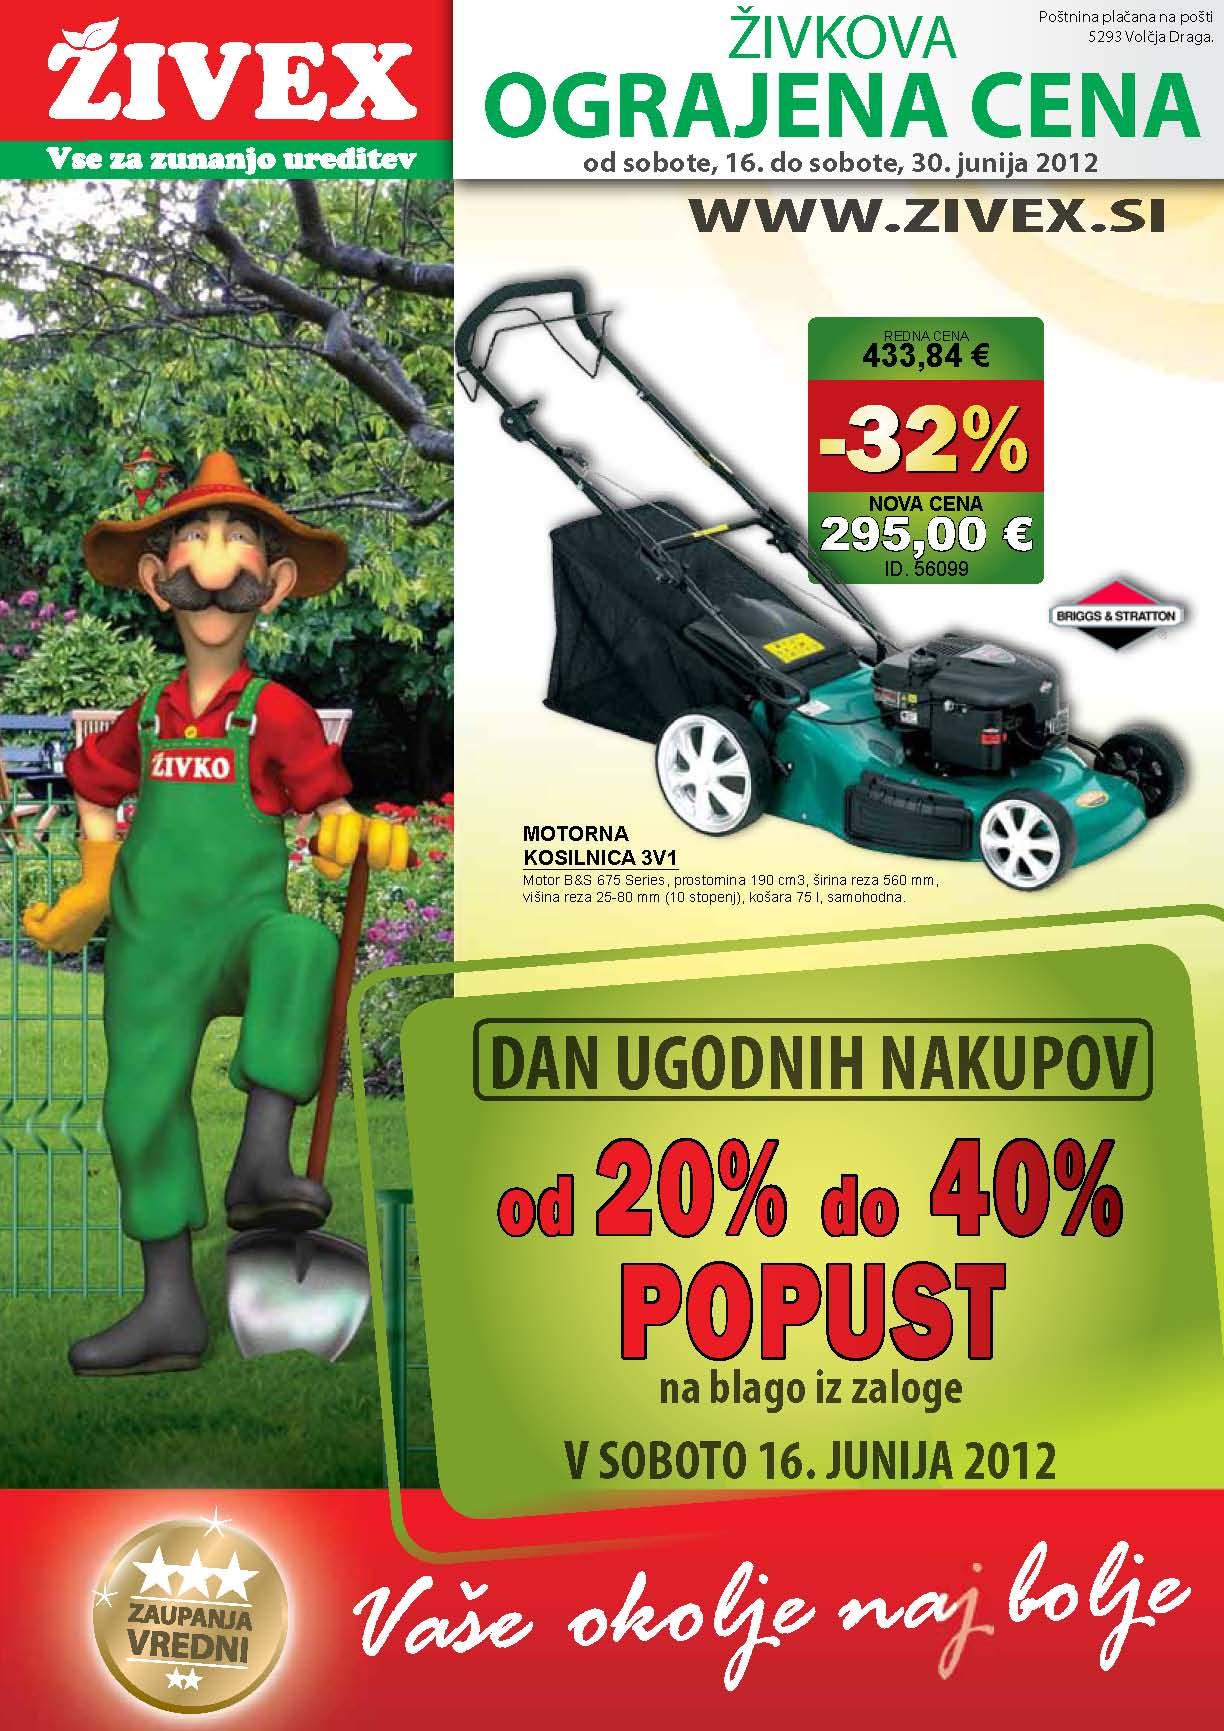 Živex - Katalog junij 2012